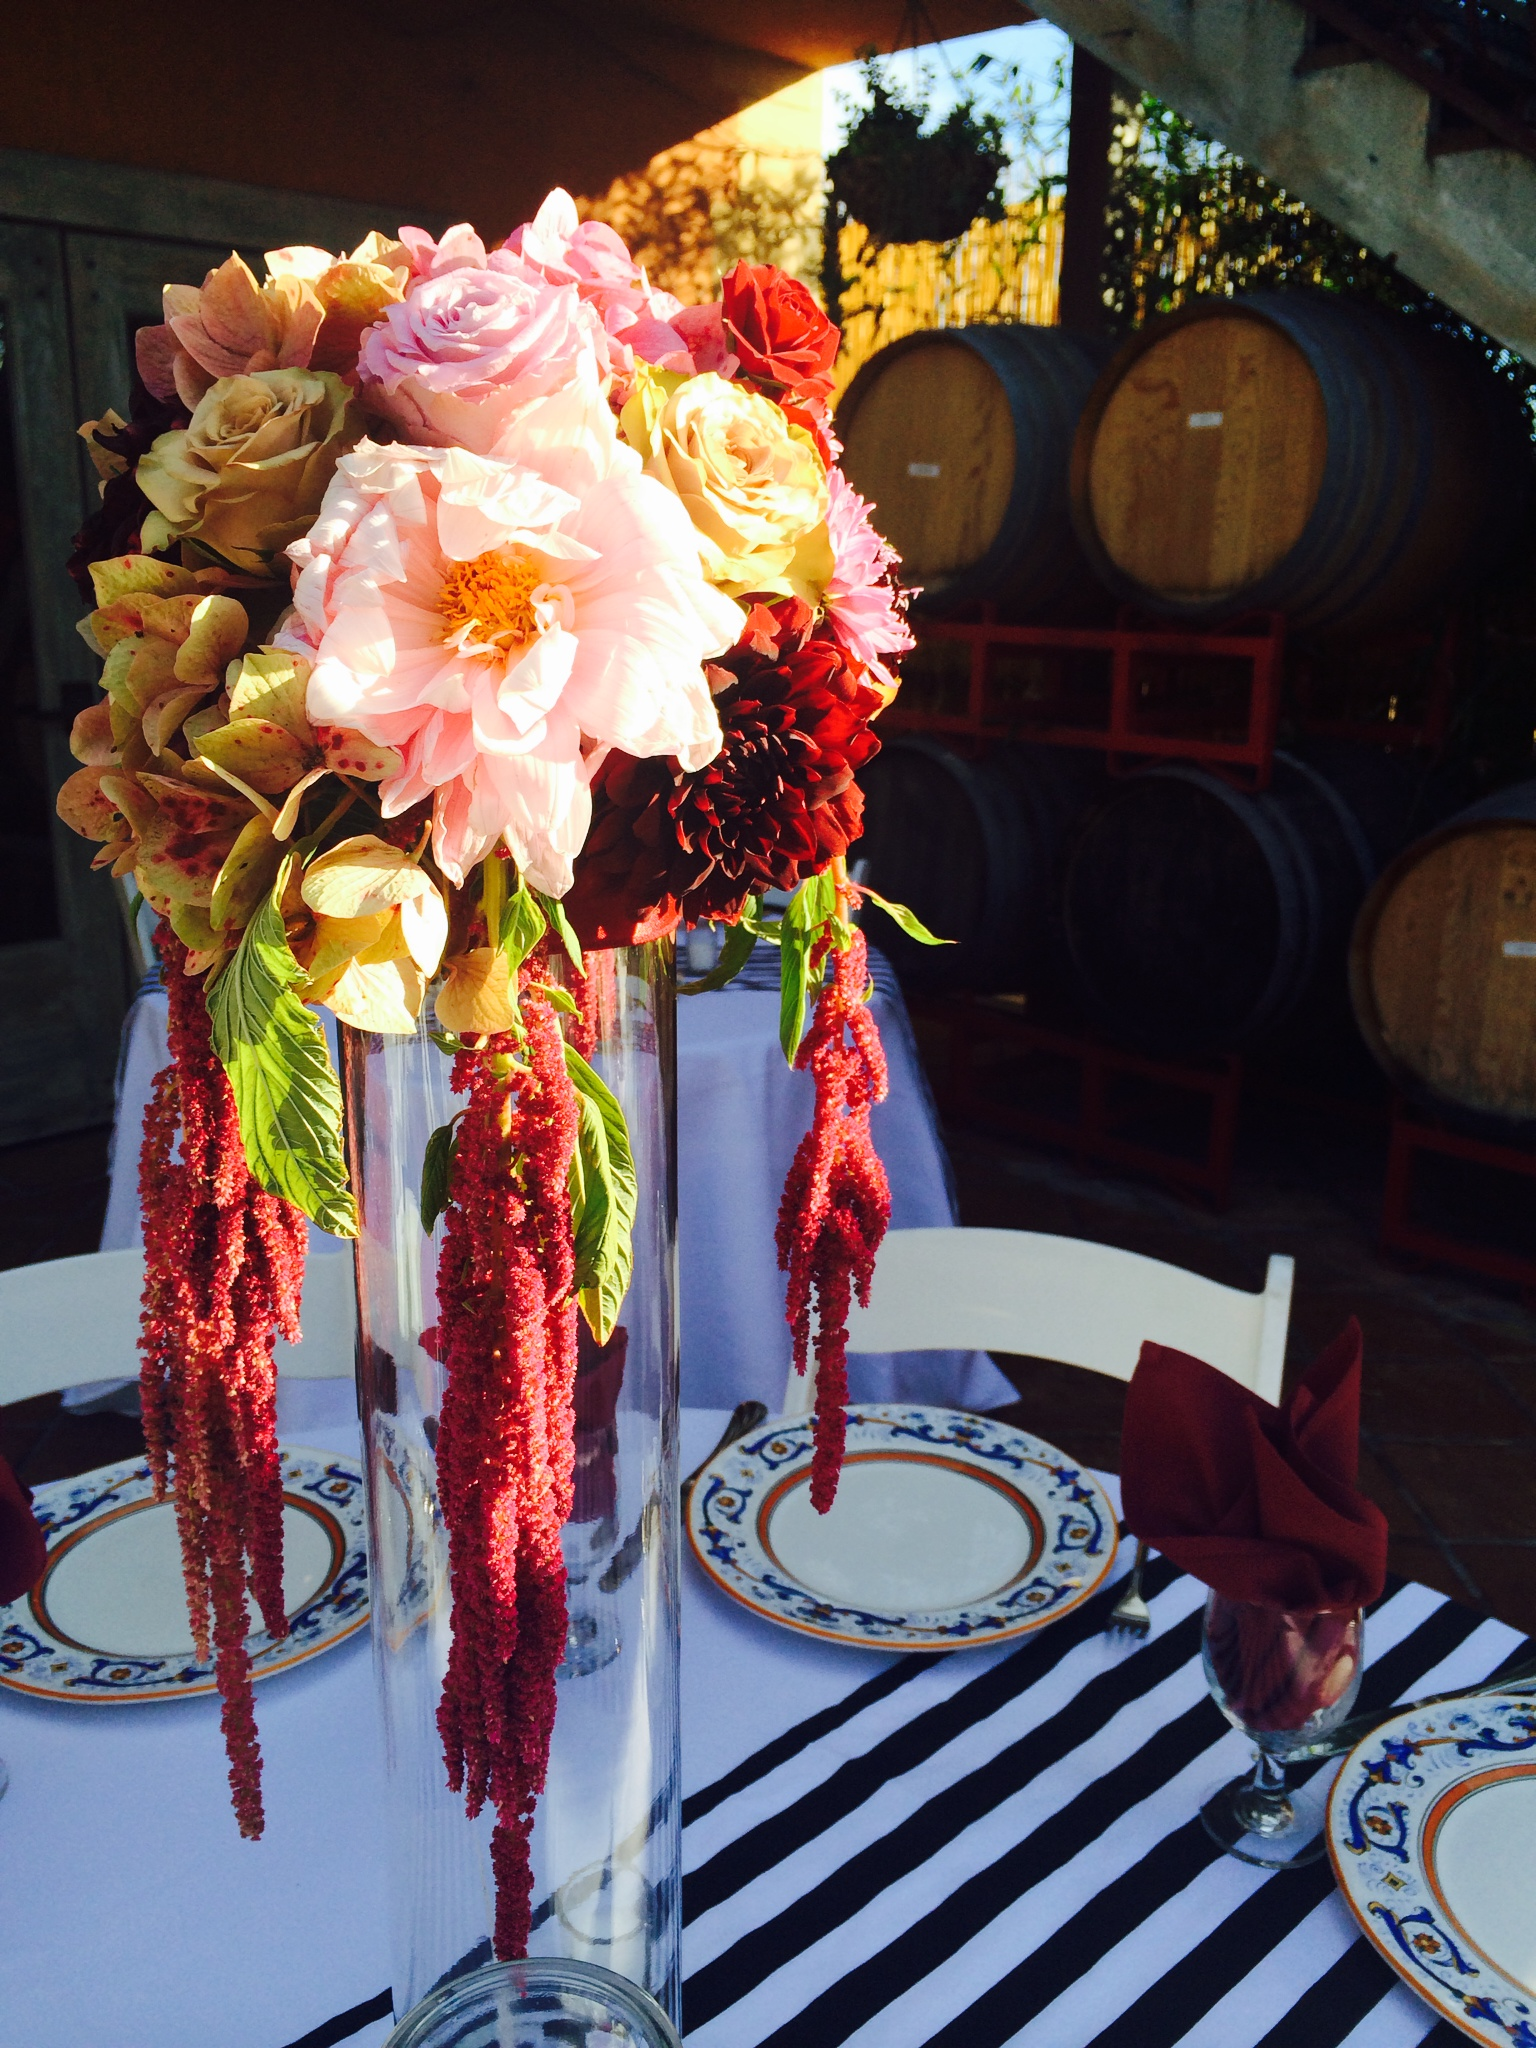 Tall floral arrangements